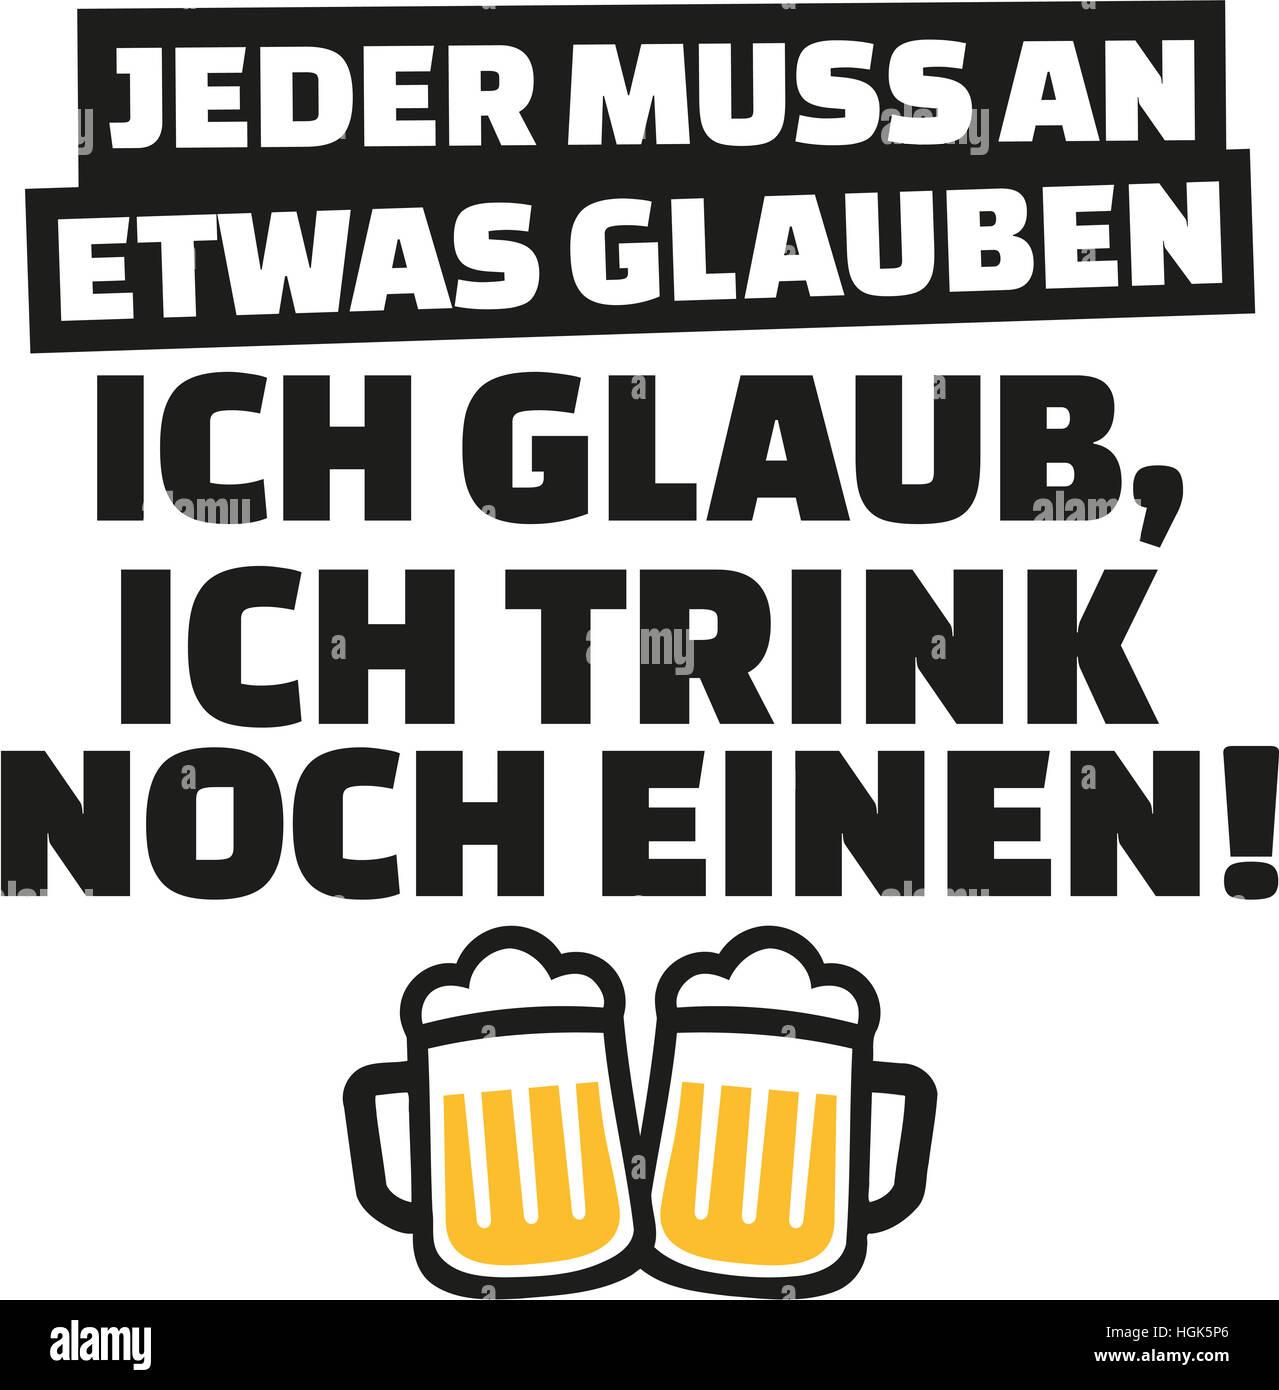 Everyone has to believe in something, I believe in having one more drink. German saying. - Stock Image